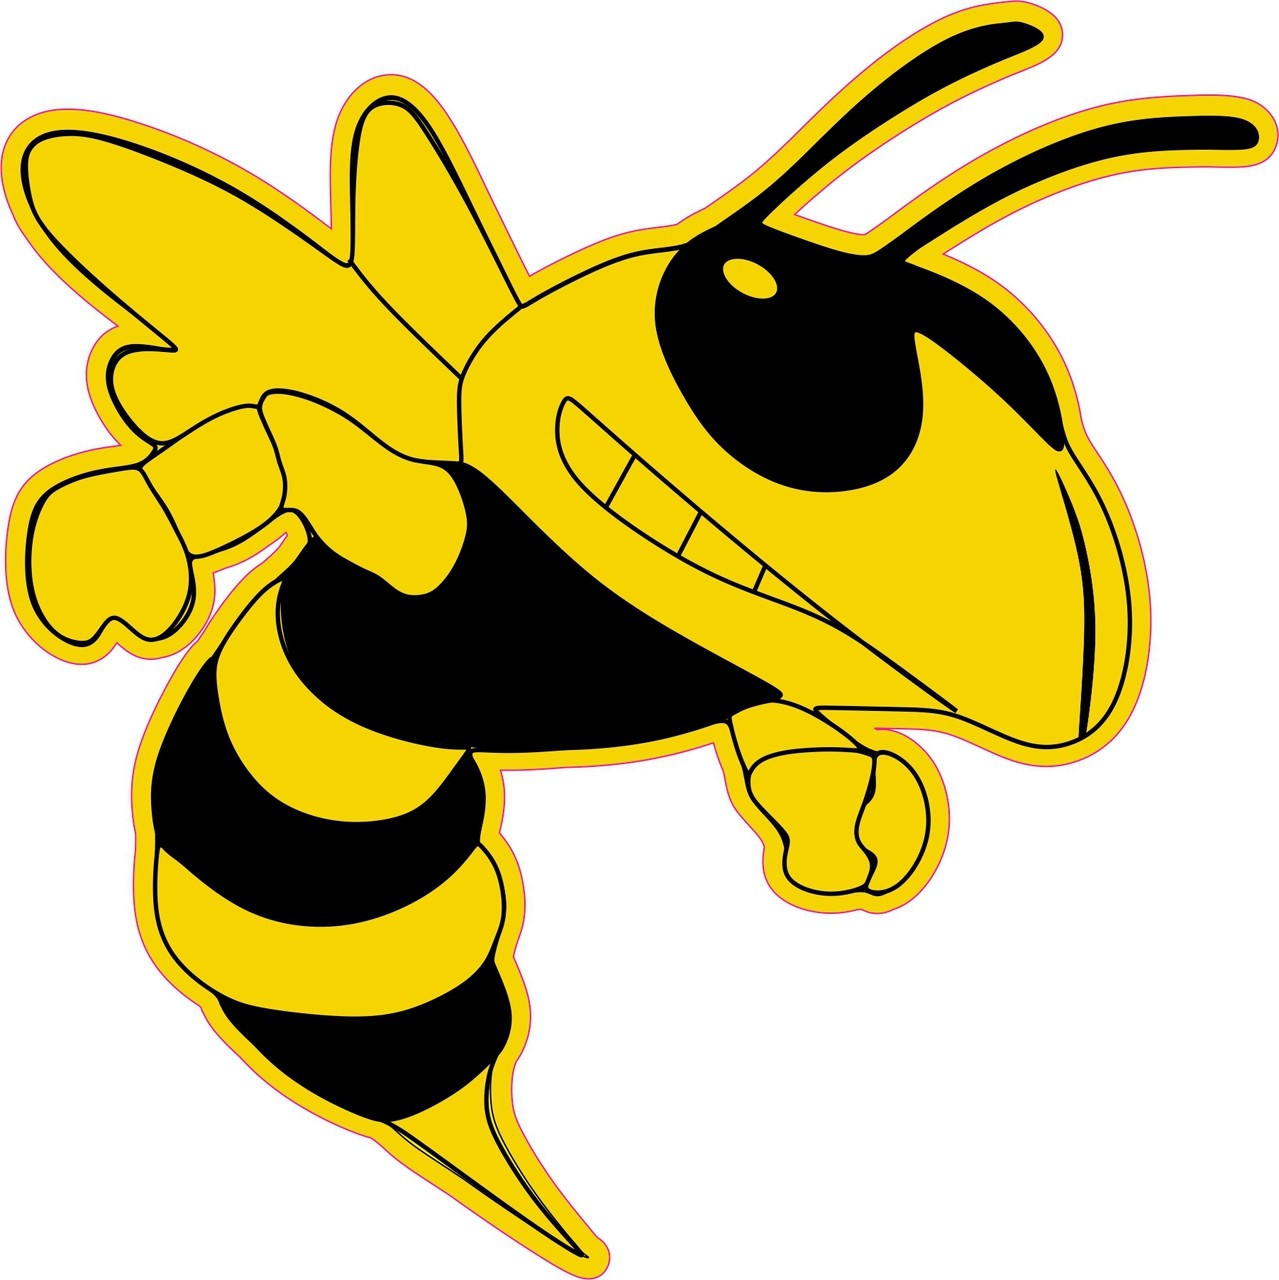 6in X 6in Right Facing Yellow Black Hornet Bee Masco Bumper Sticker